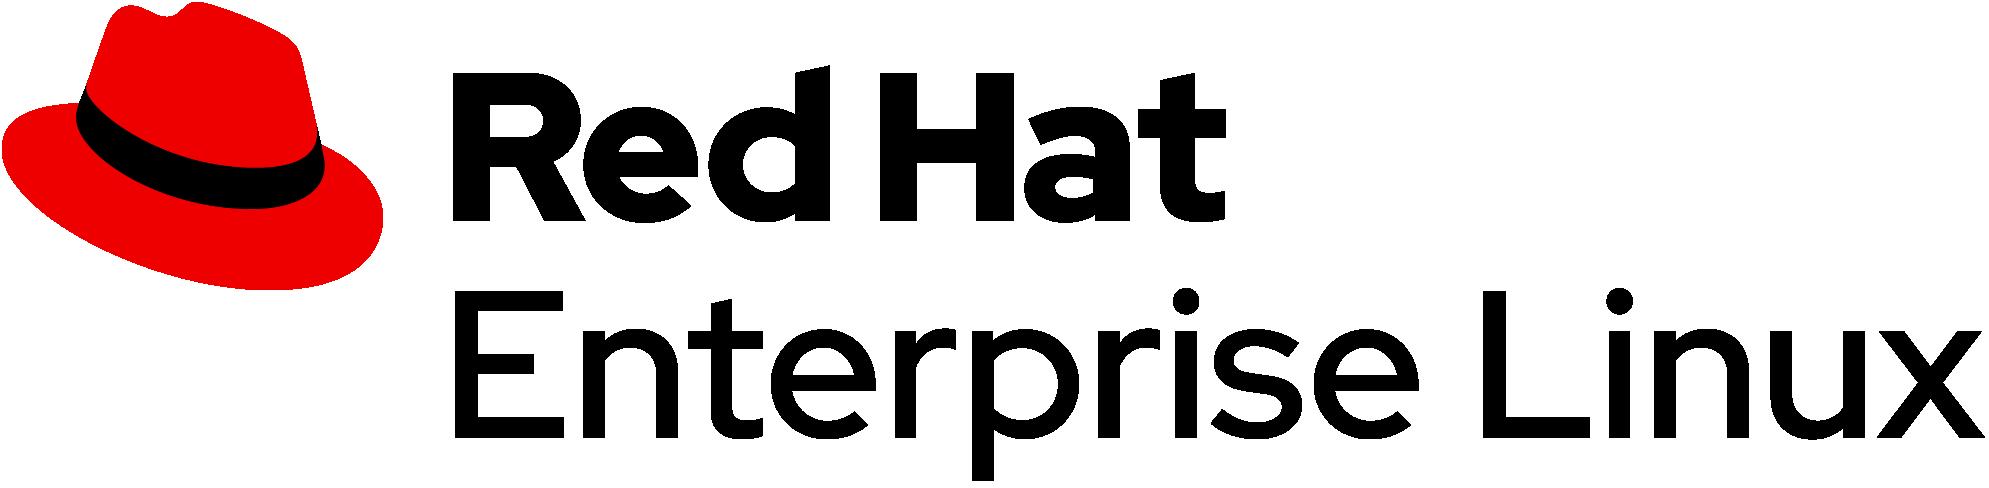 RHEL logo